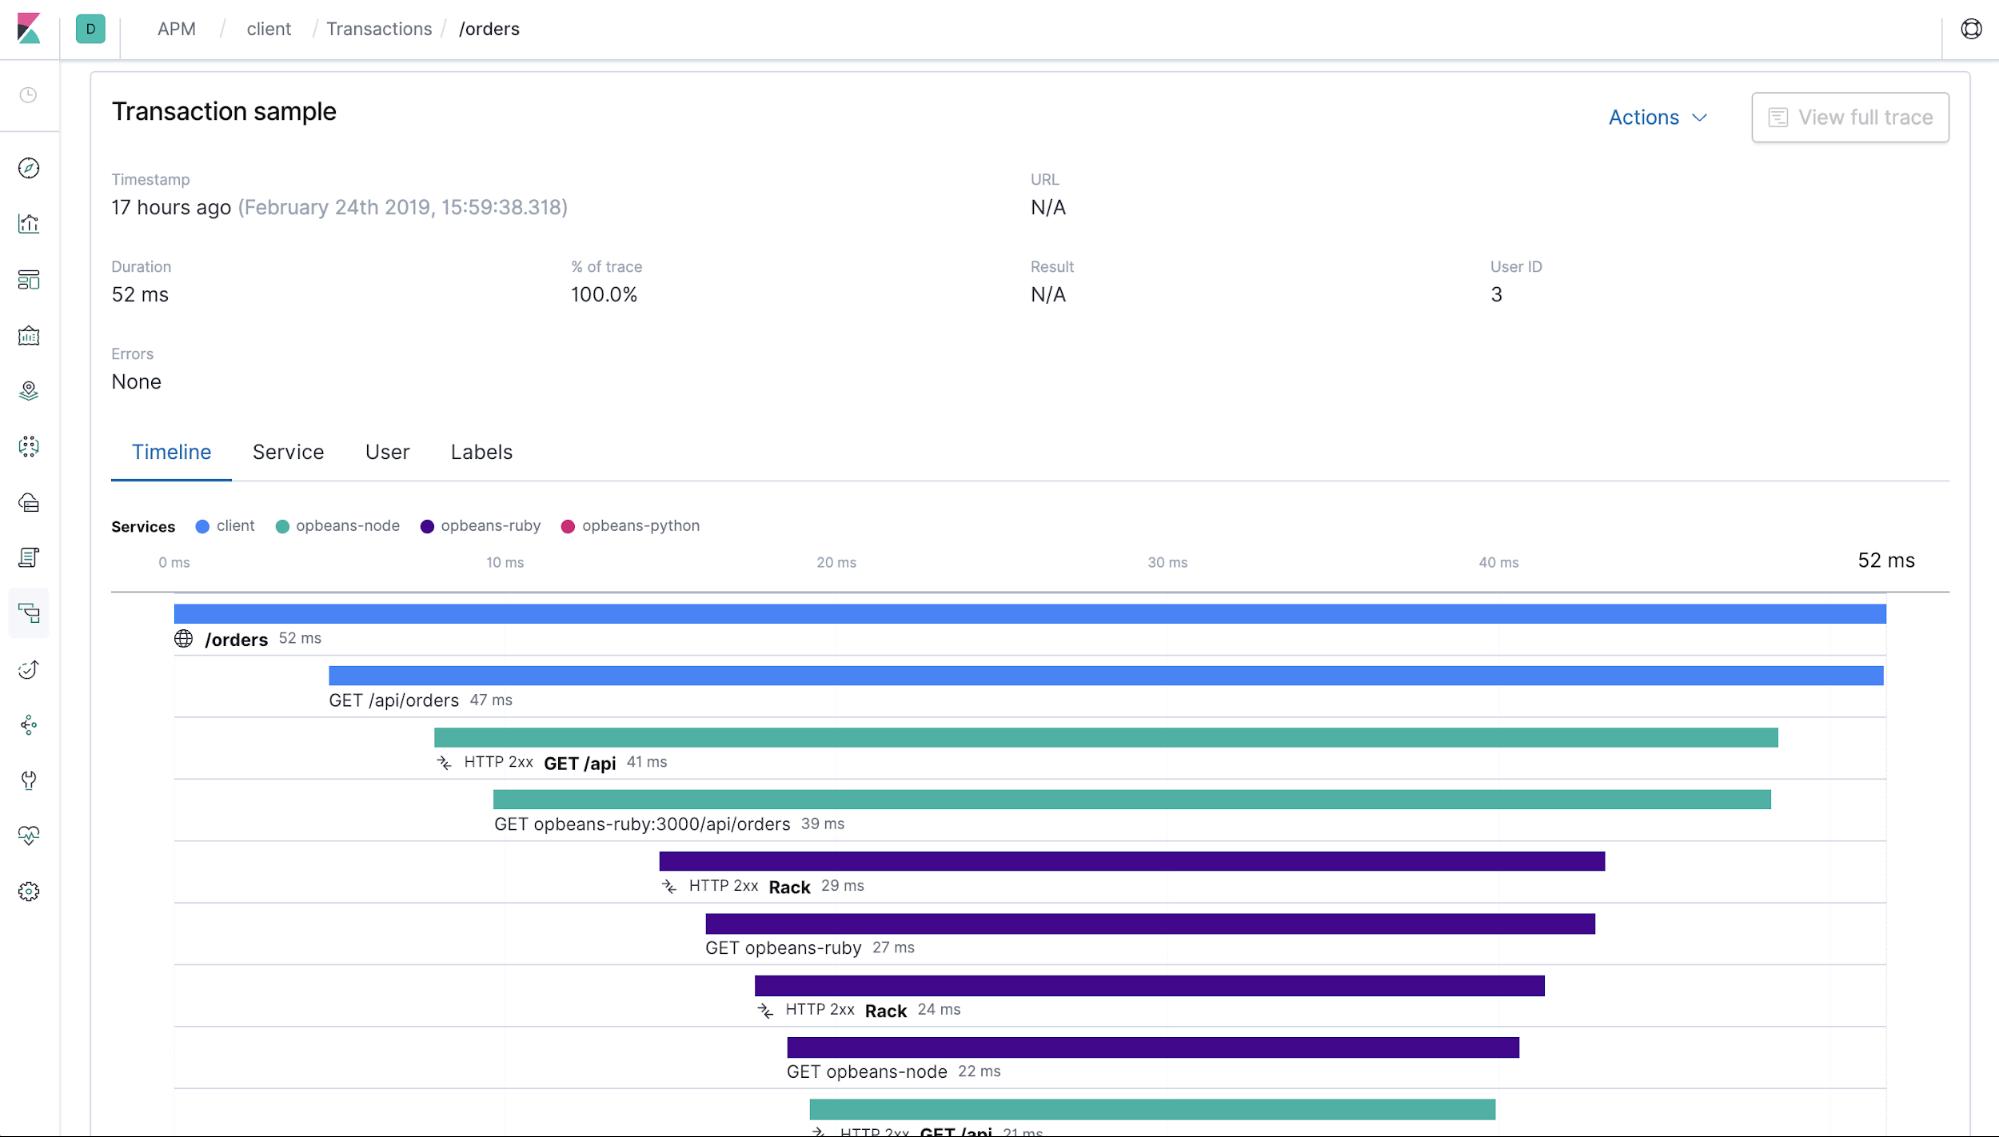 APM dashboard showing transaction sample